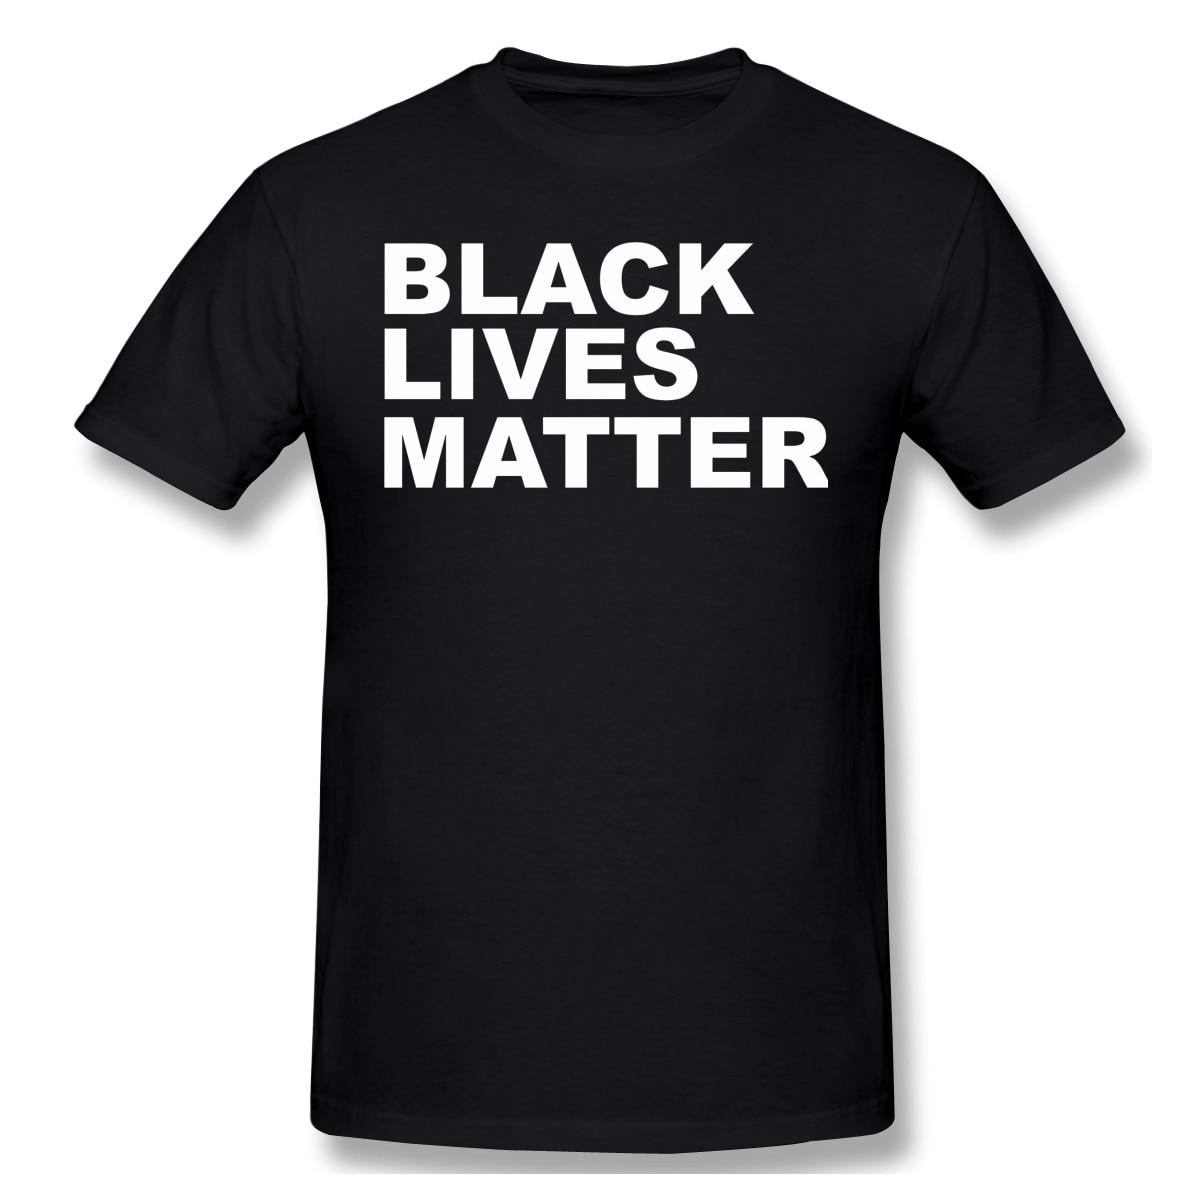 Tops y camisetas, de BLACK LIVES MATTER de banda para camiseta viva de black lives matter anonymous George Floyd manga corta